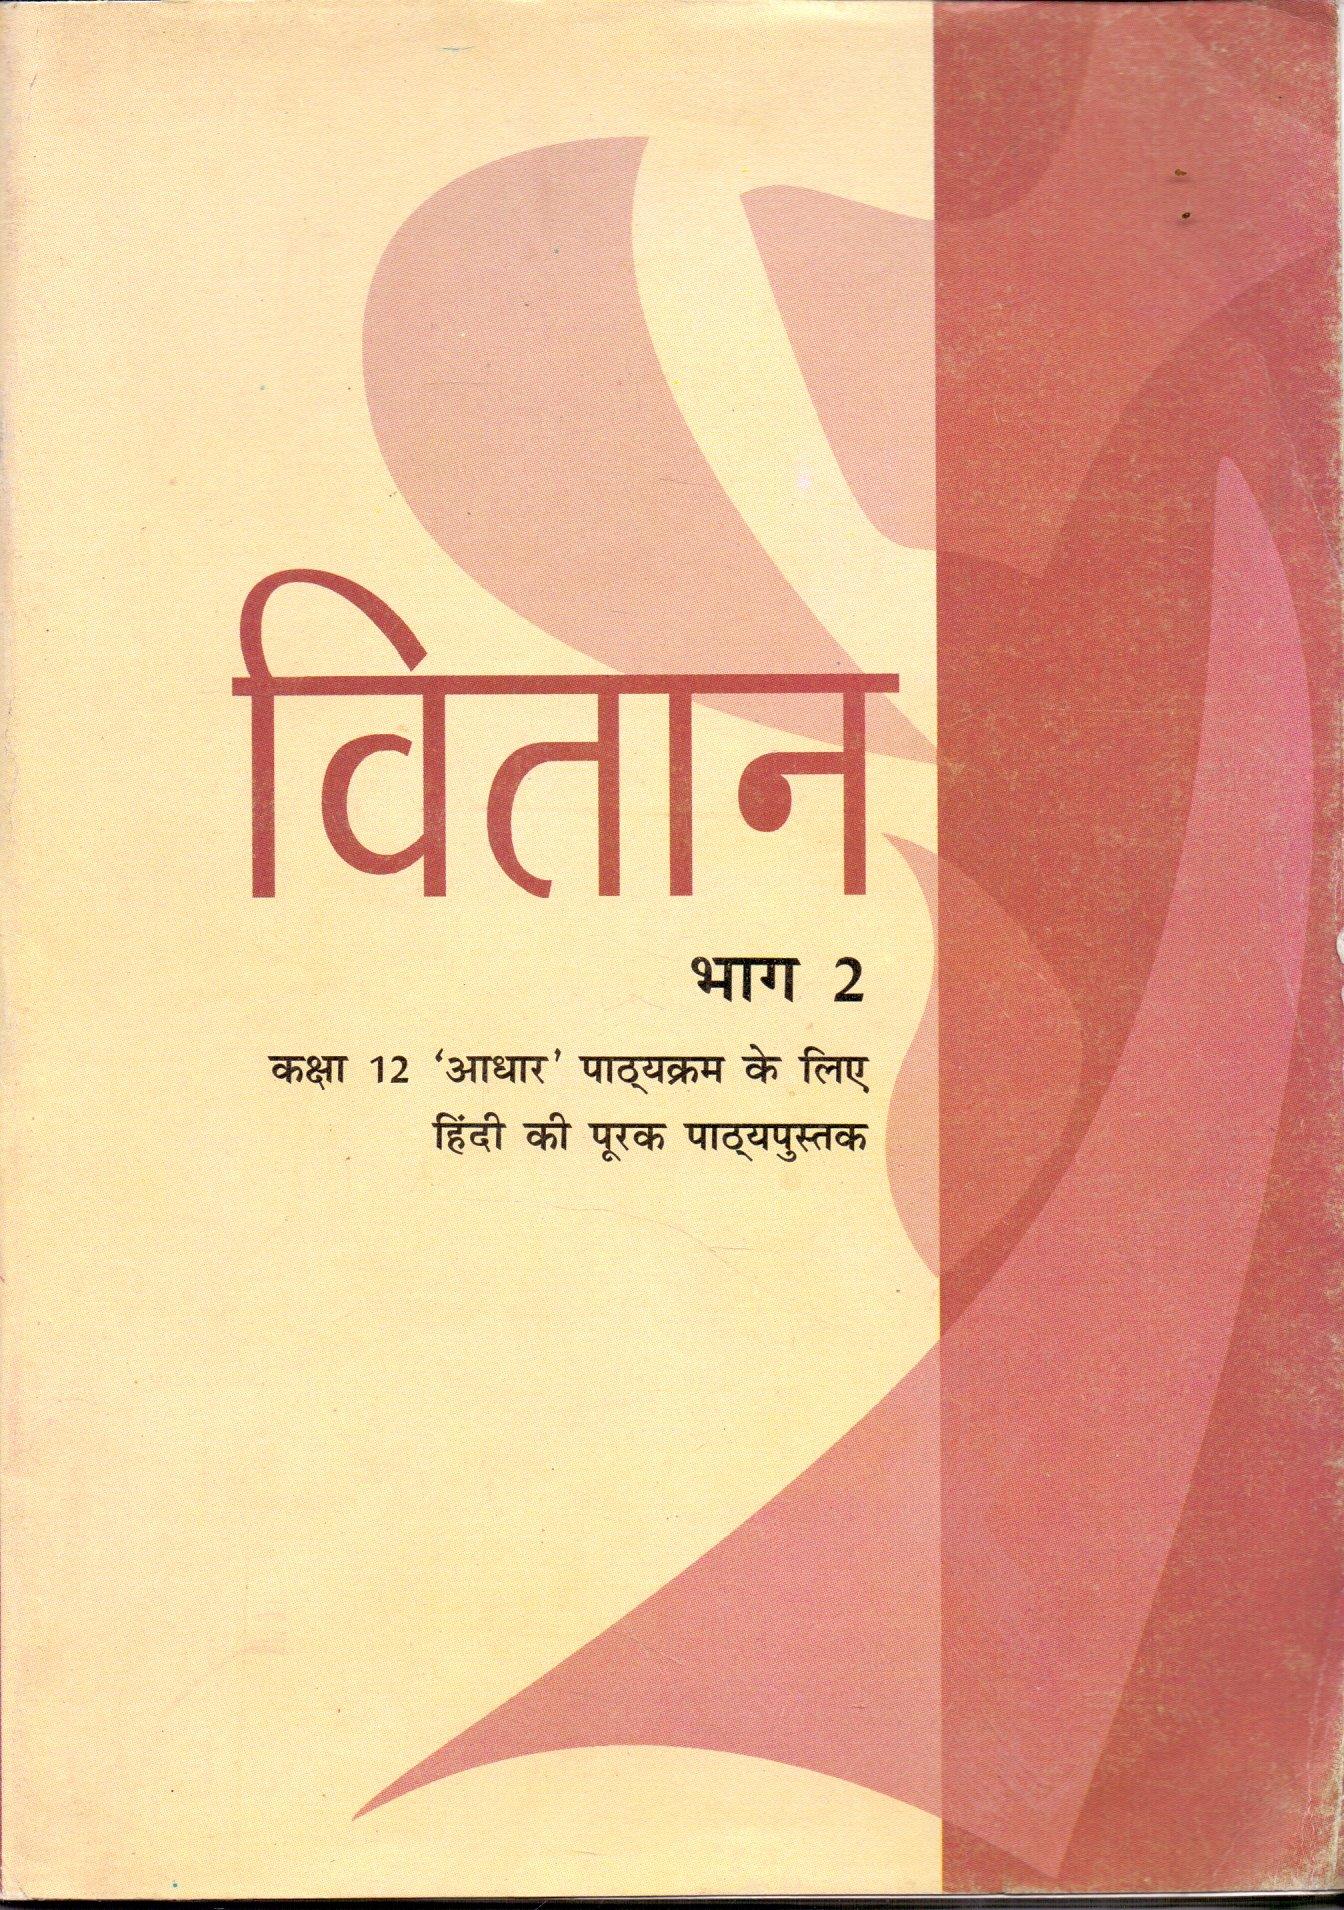 Poster design class 12 - Vitaan Part 2 Hindi Core Textbook For Class 12 12071